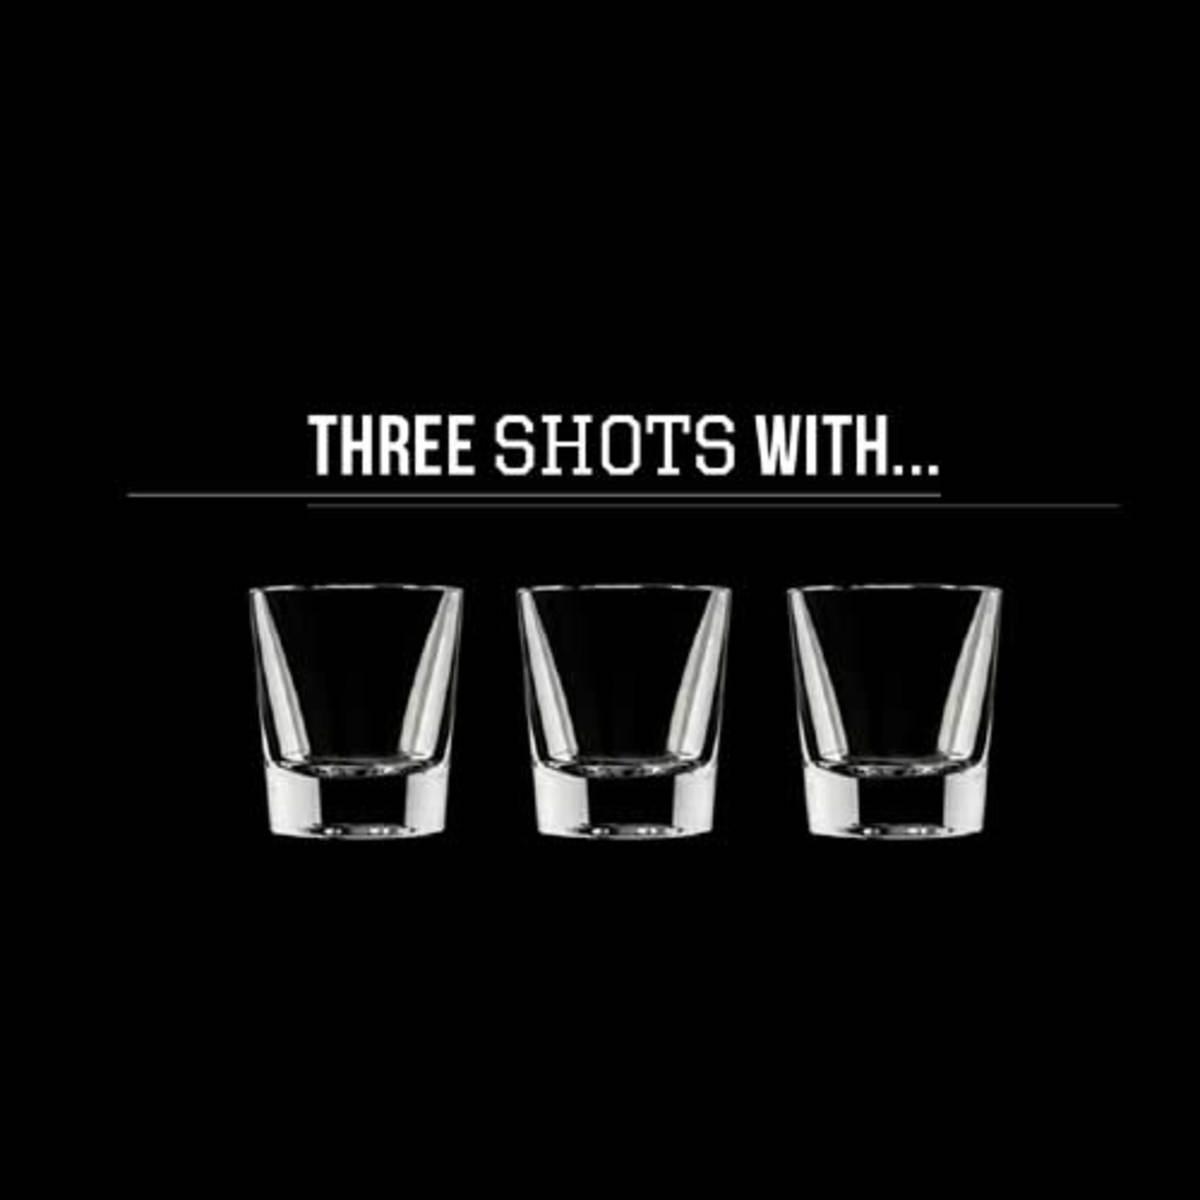 3shotswith.jpg